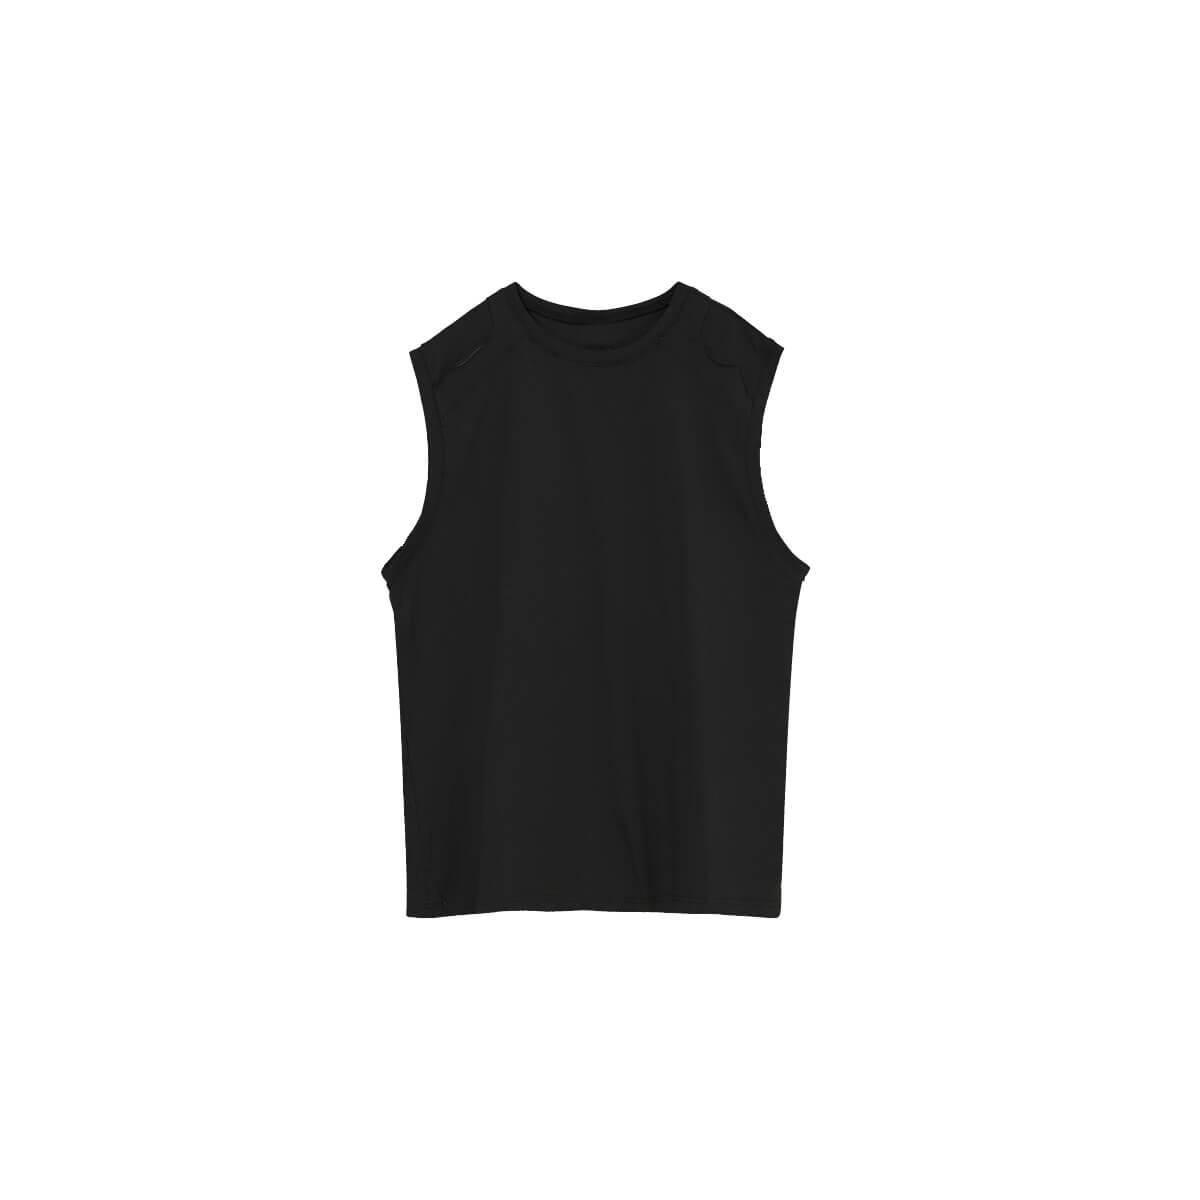 Майка Cui Layout Studio Tank Top Ripped Shoulders Black